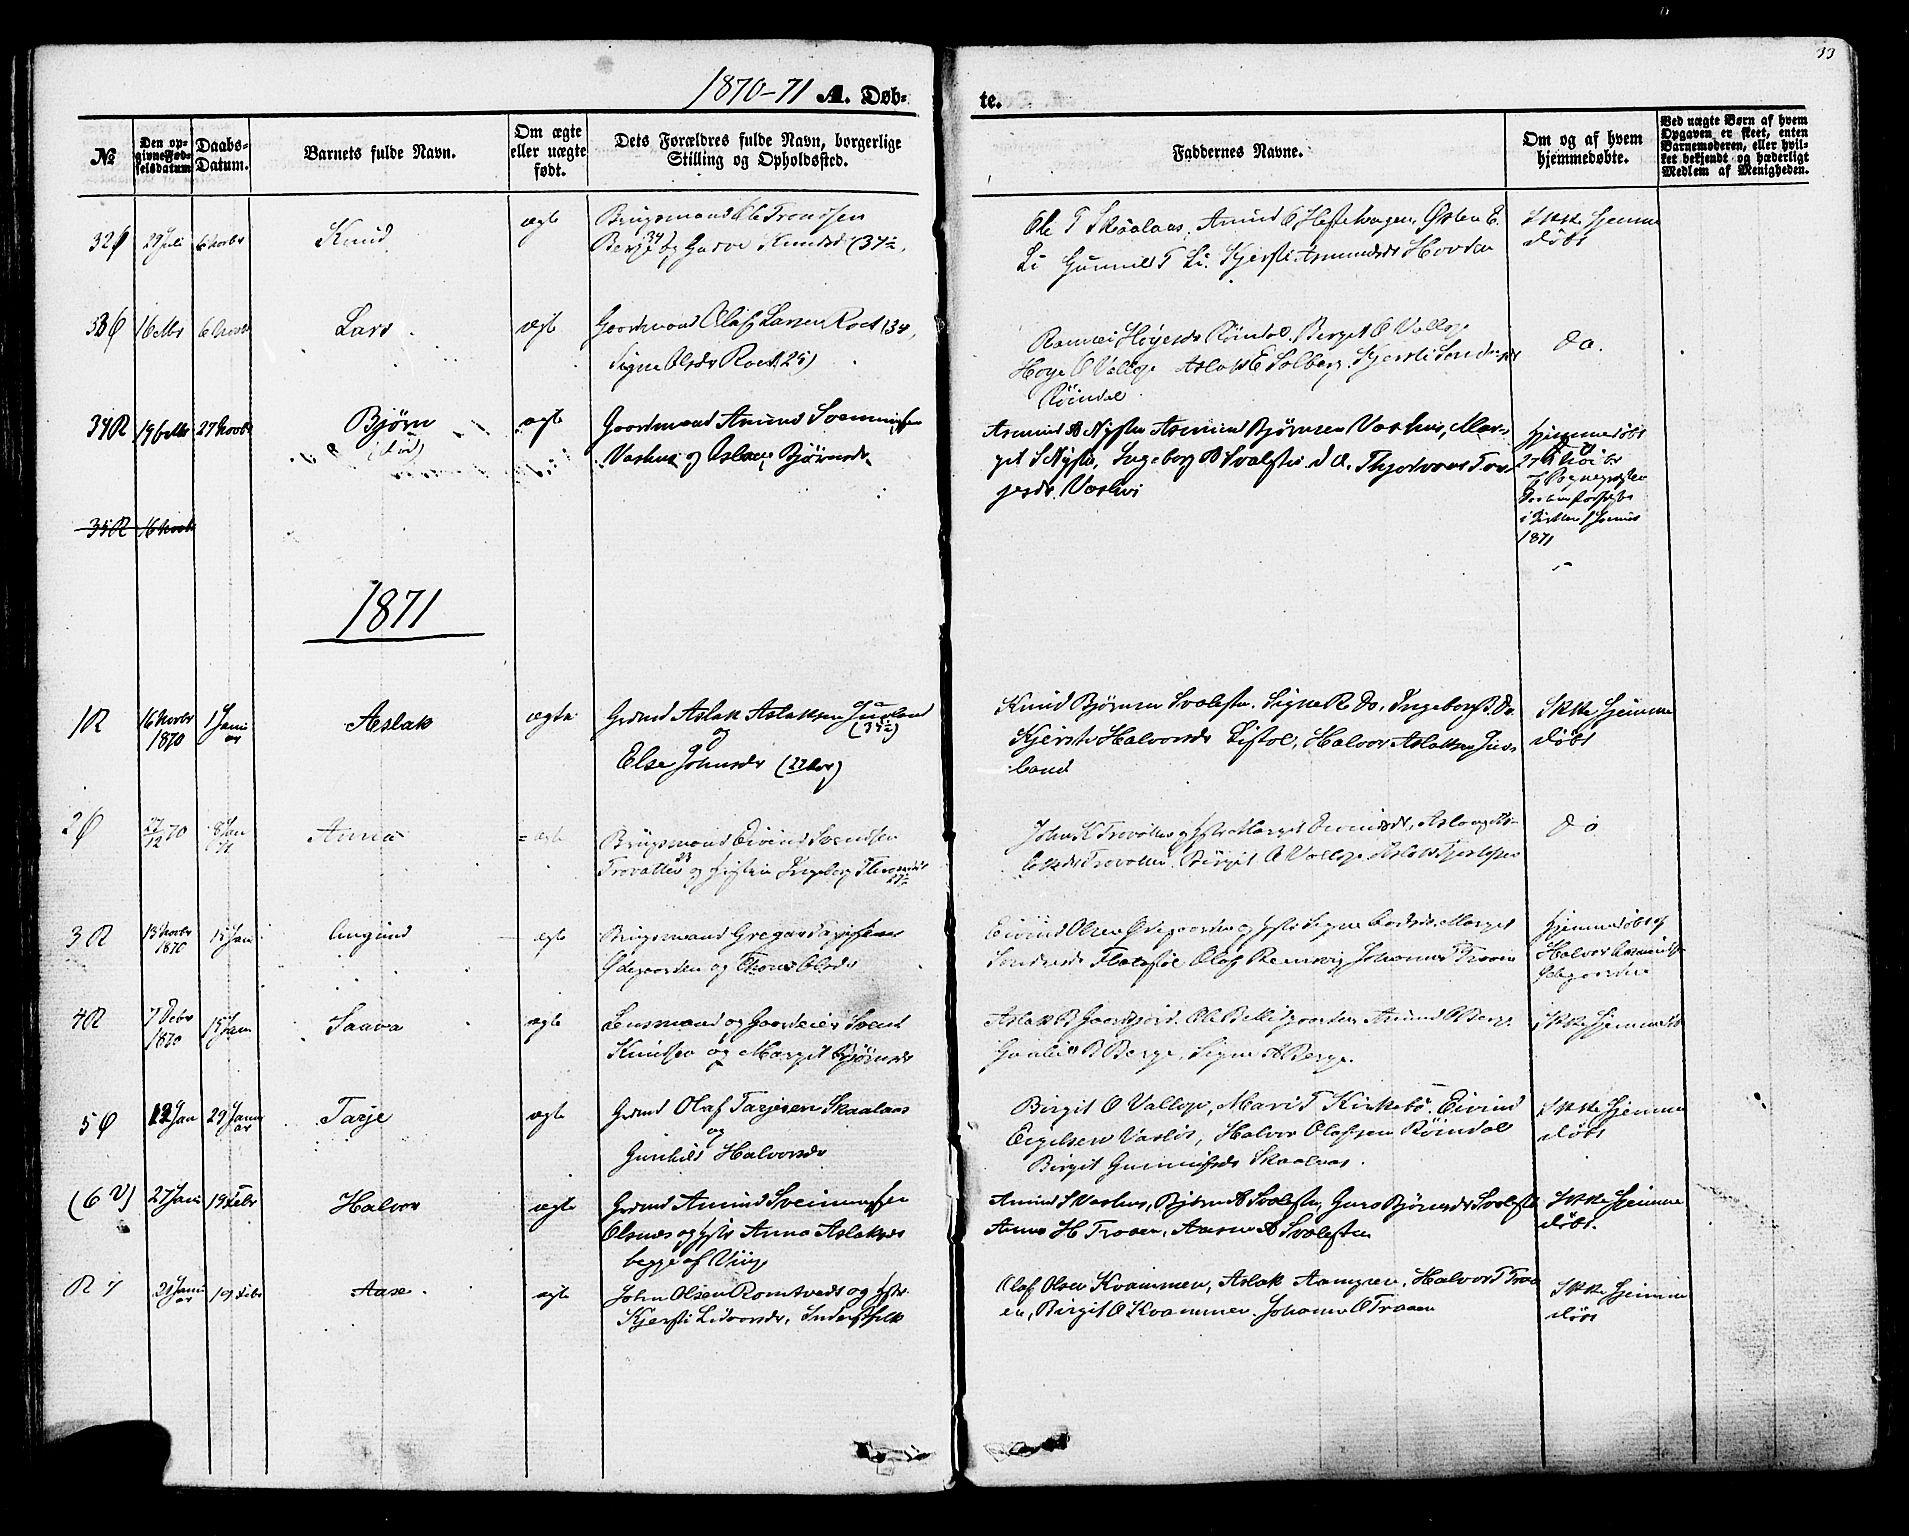 SAKO, Rauland kirkebøker, F/Fa/L0003: Ministerialbok nr. 3, 1859-1886, s. 33